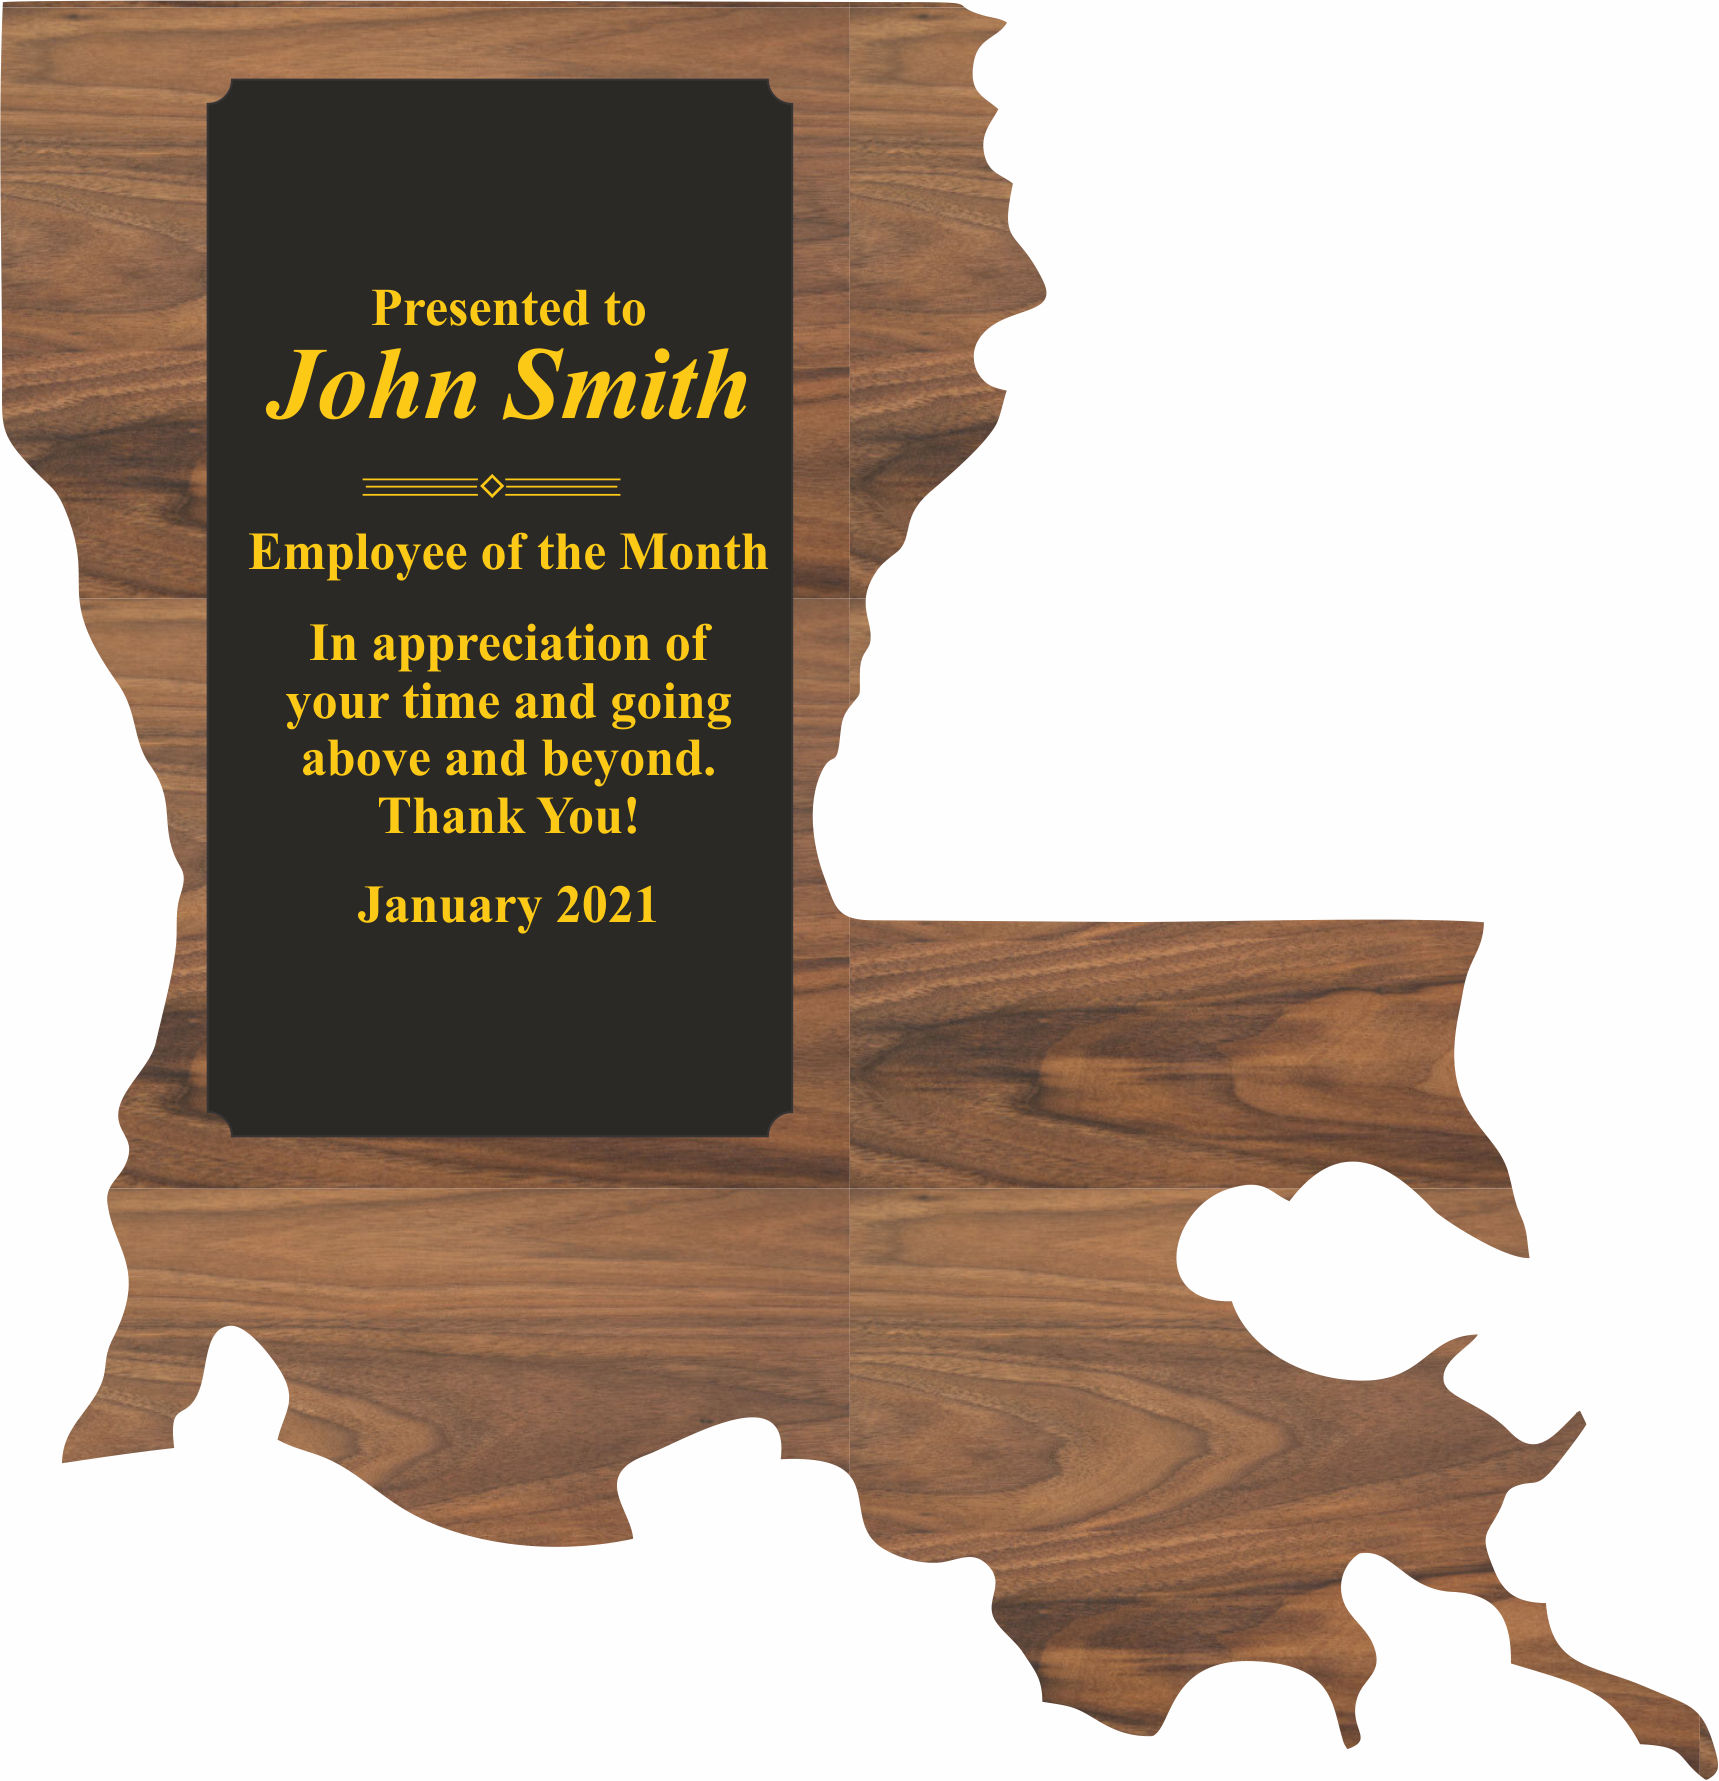 Louisiana State Shaped Promotional Items -